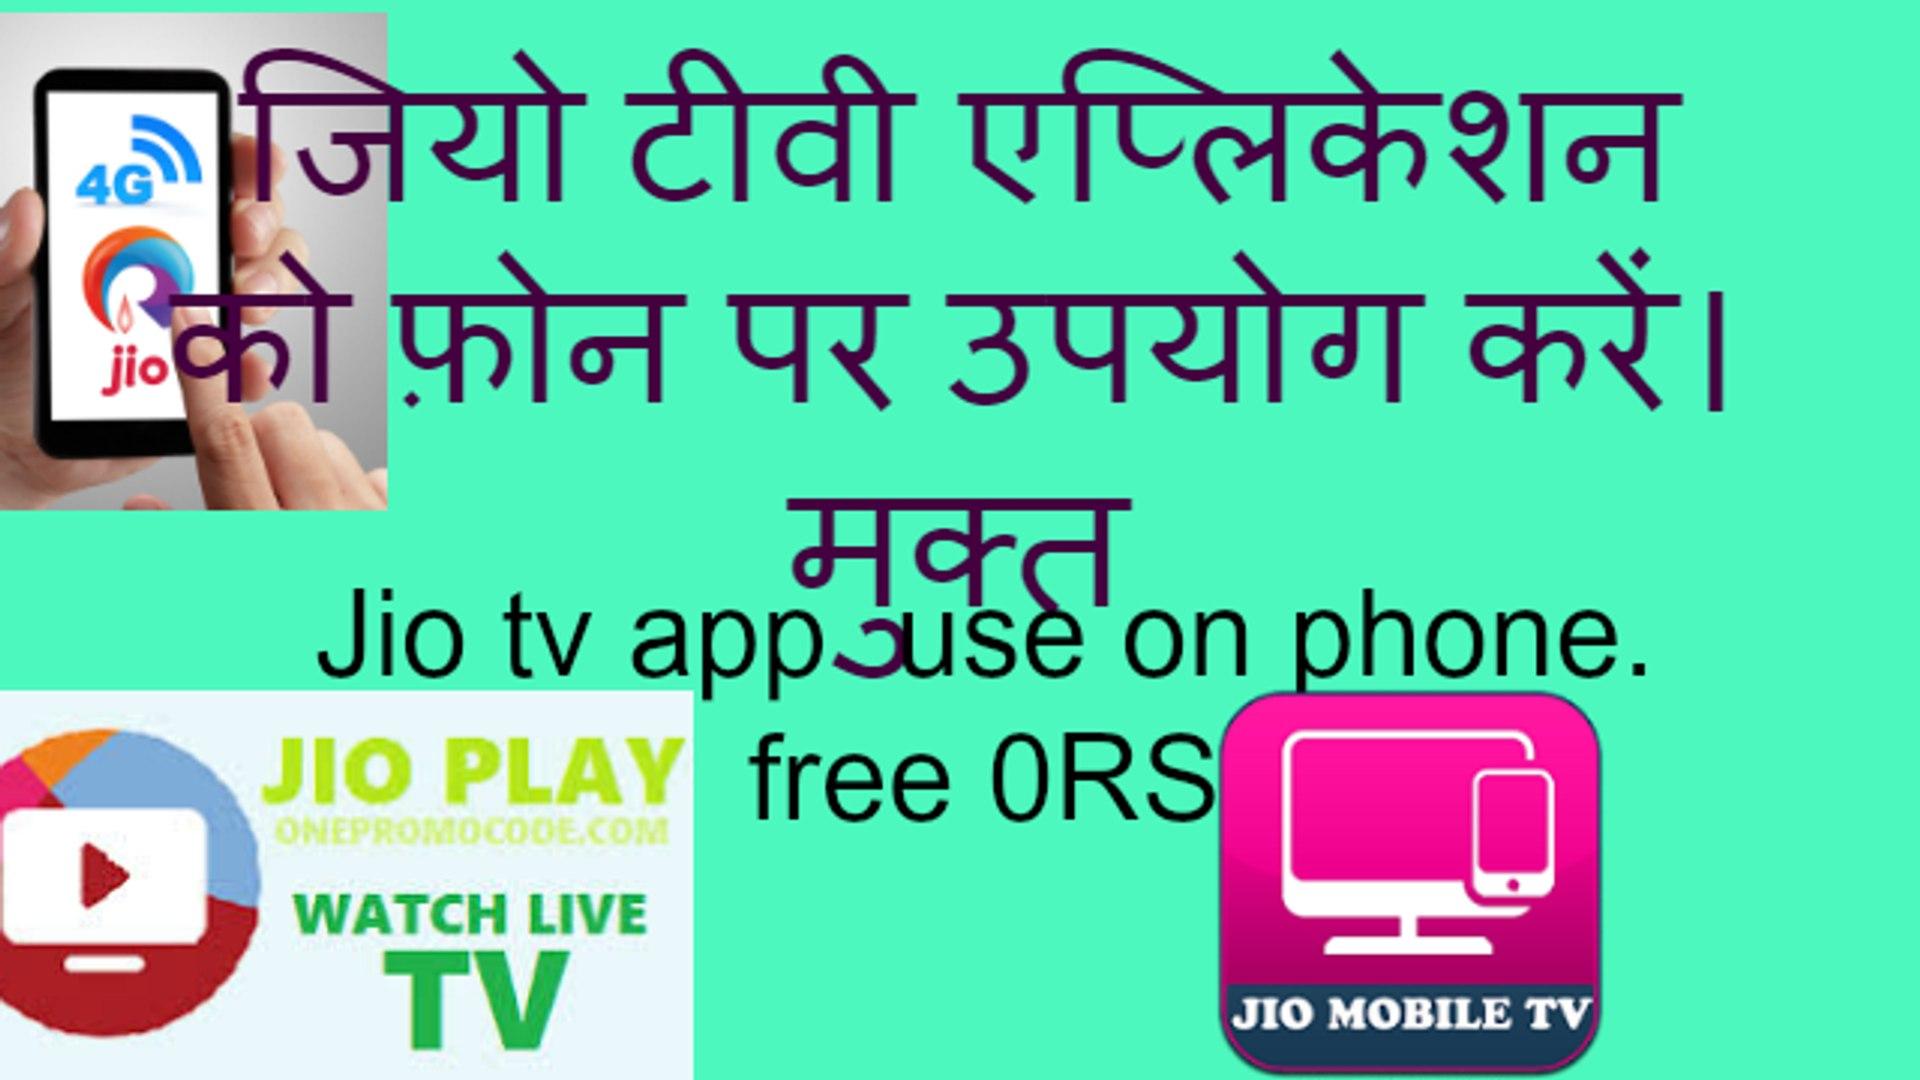 Live TV using Reliance Jio 4G Freehow to install jio tv app